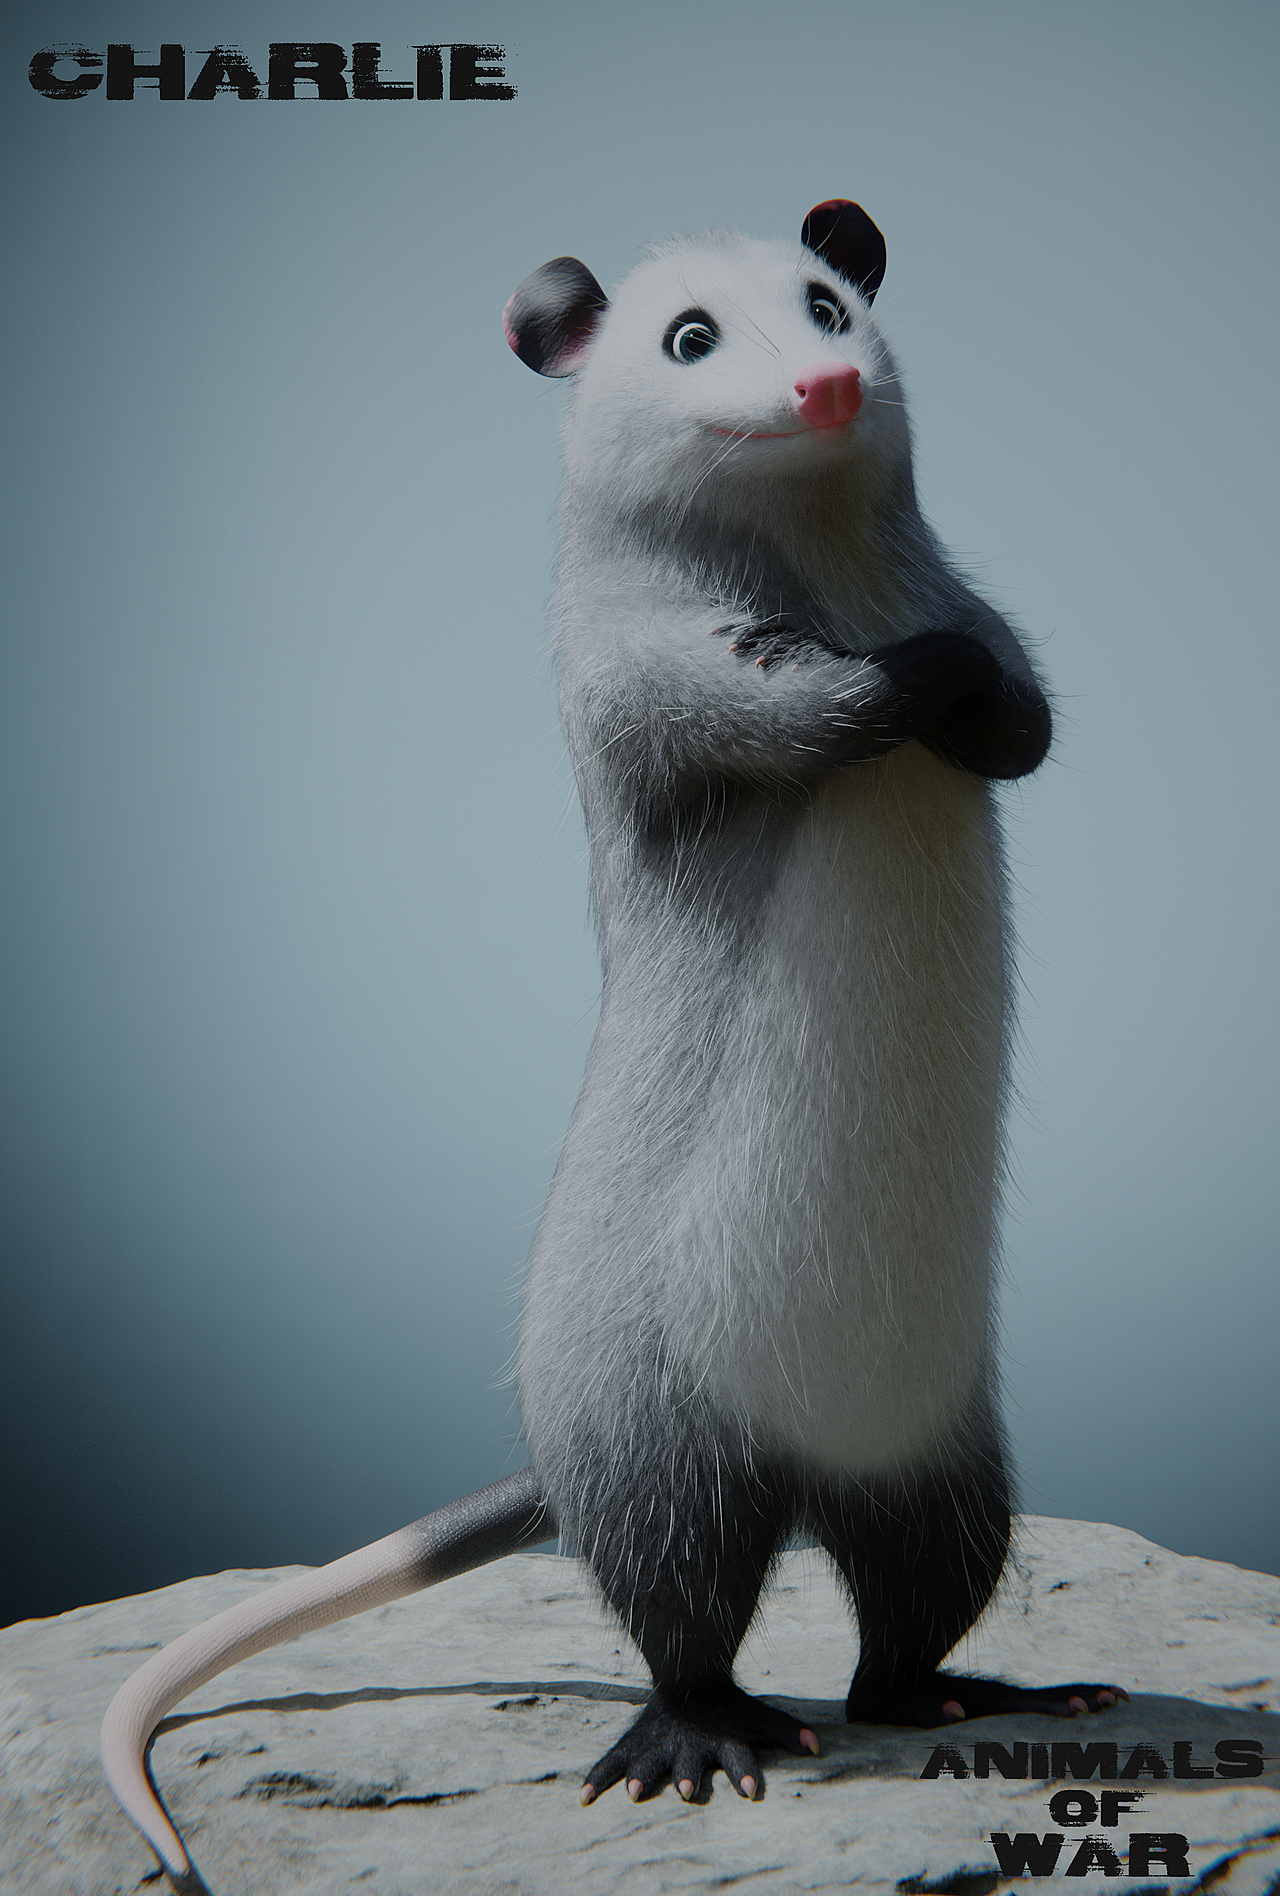 Charlie The Opossum!